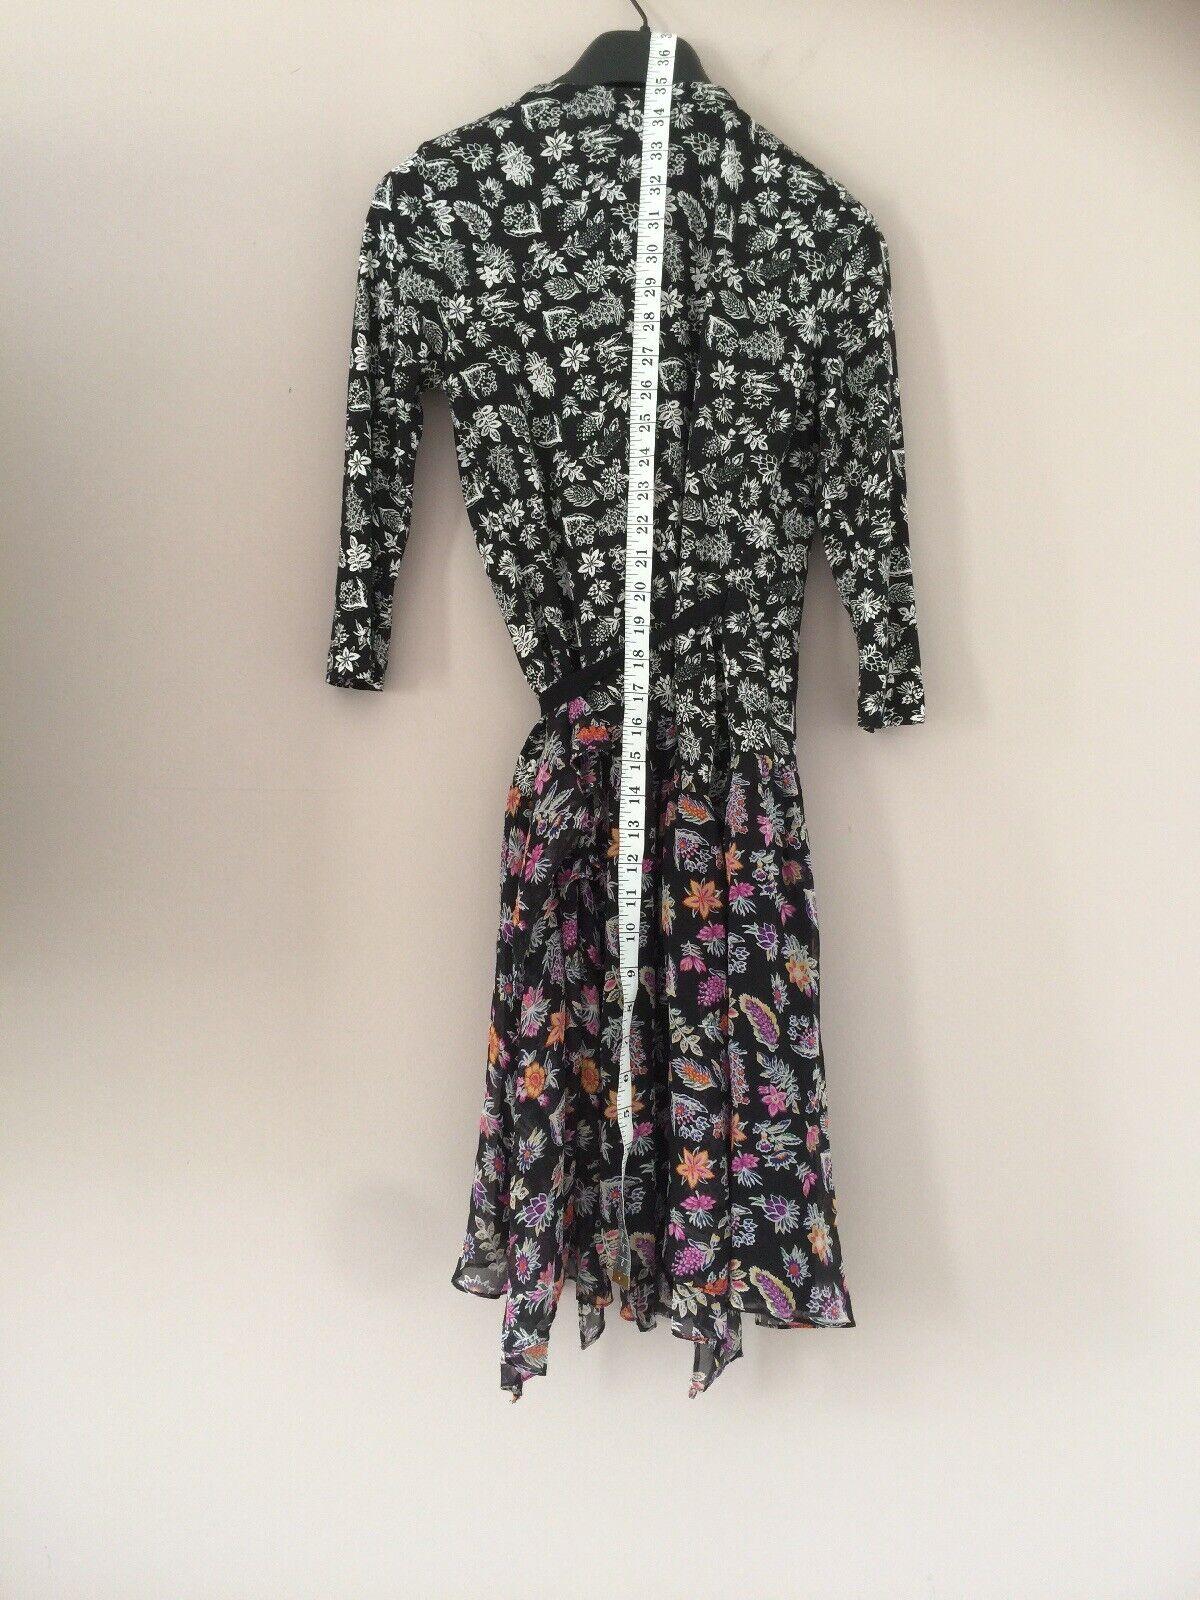 Dvf Dress - image 6